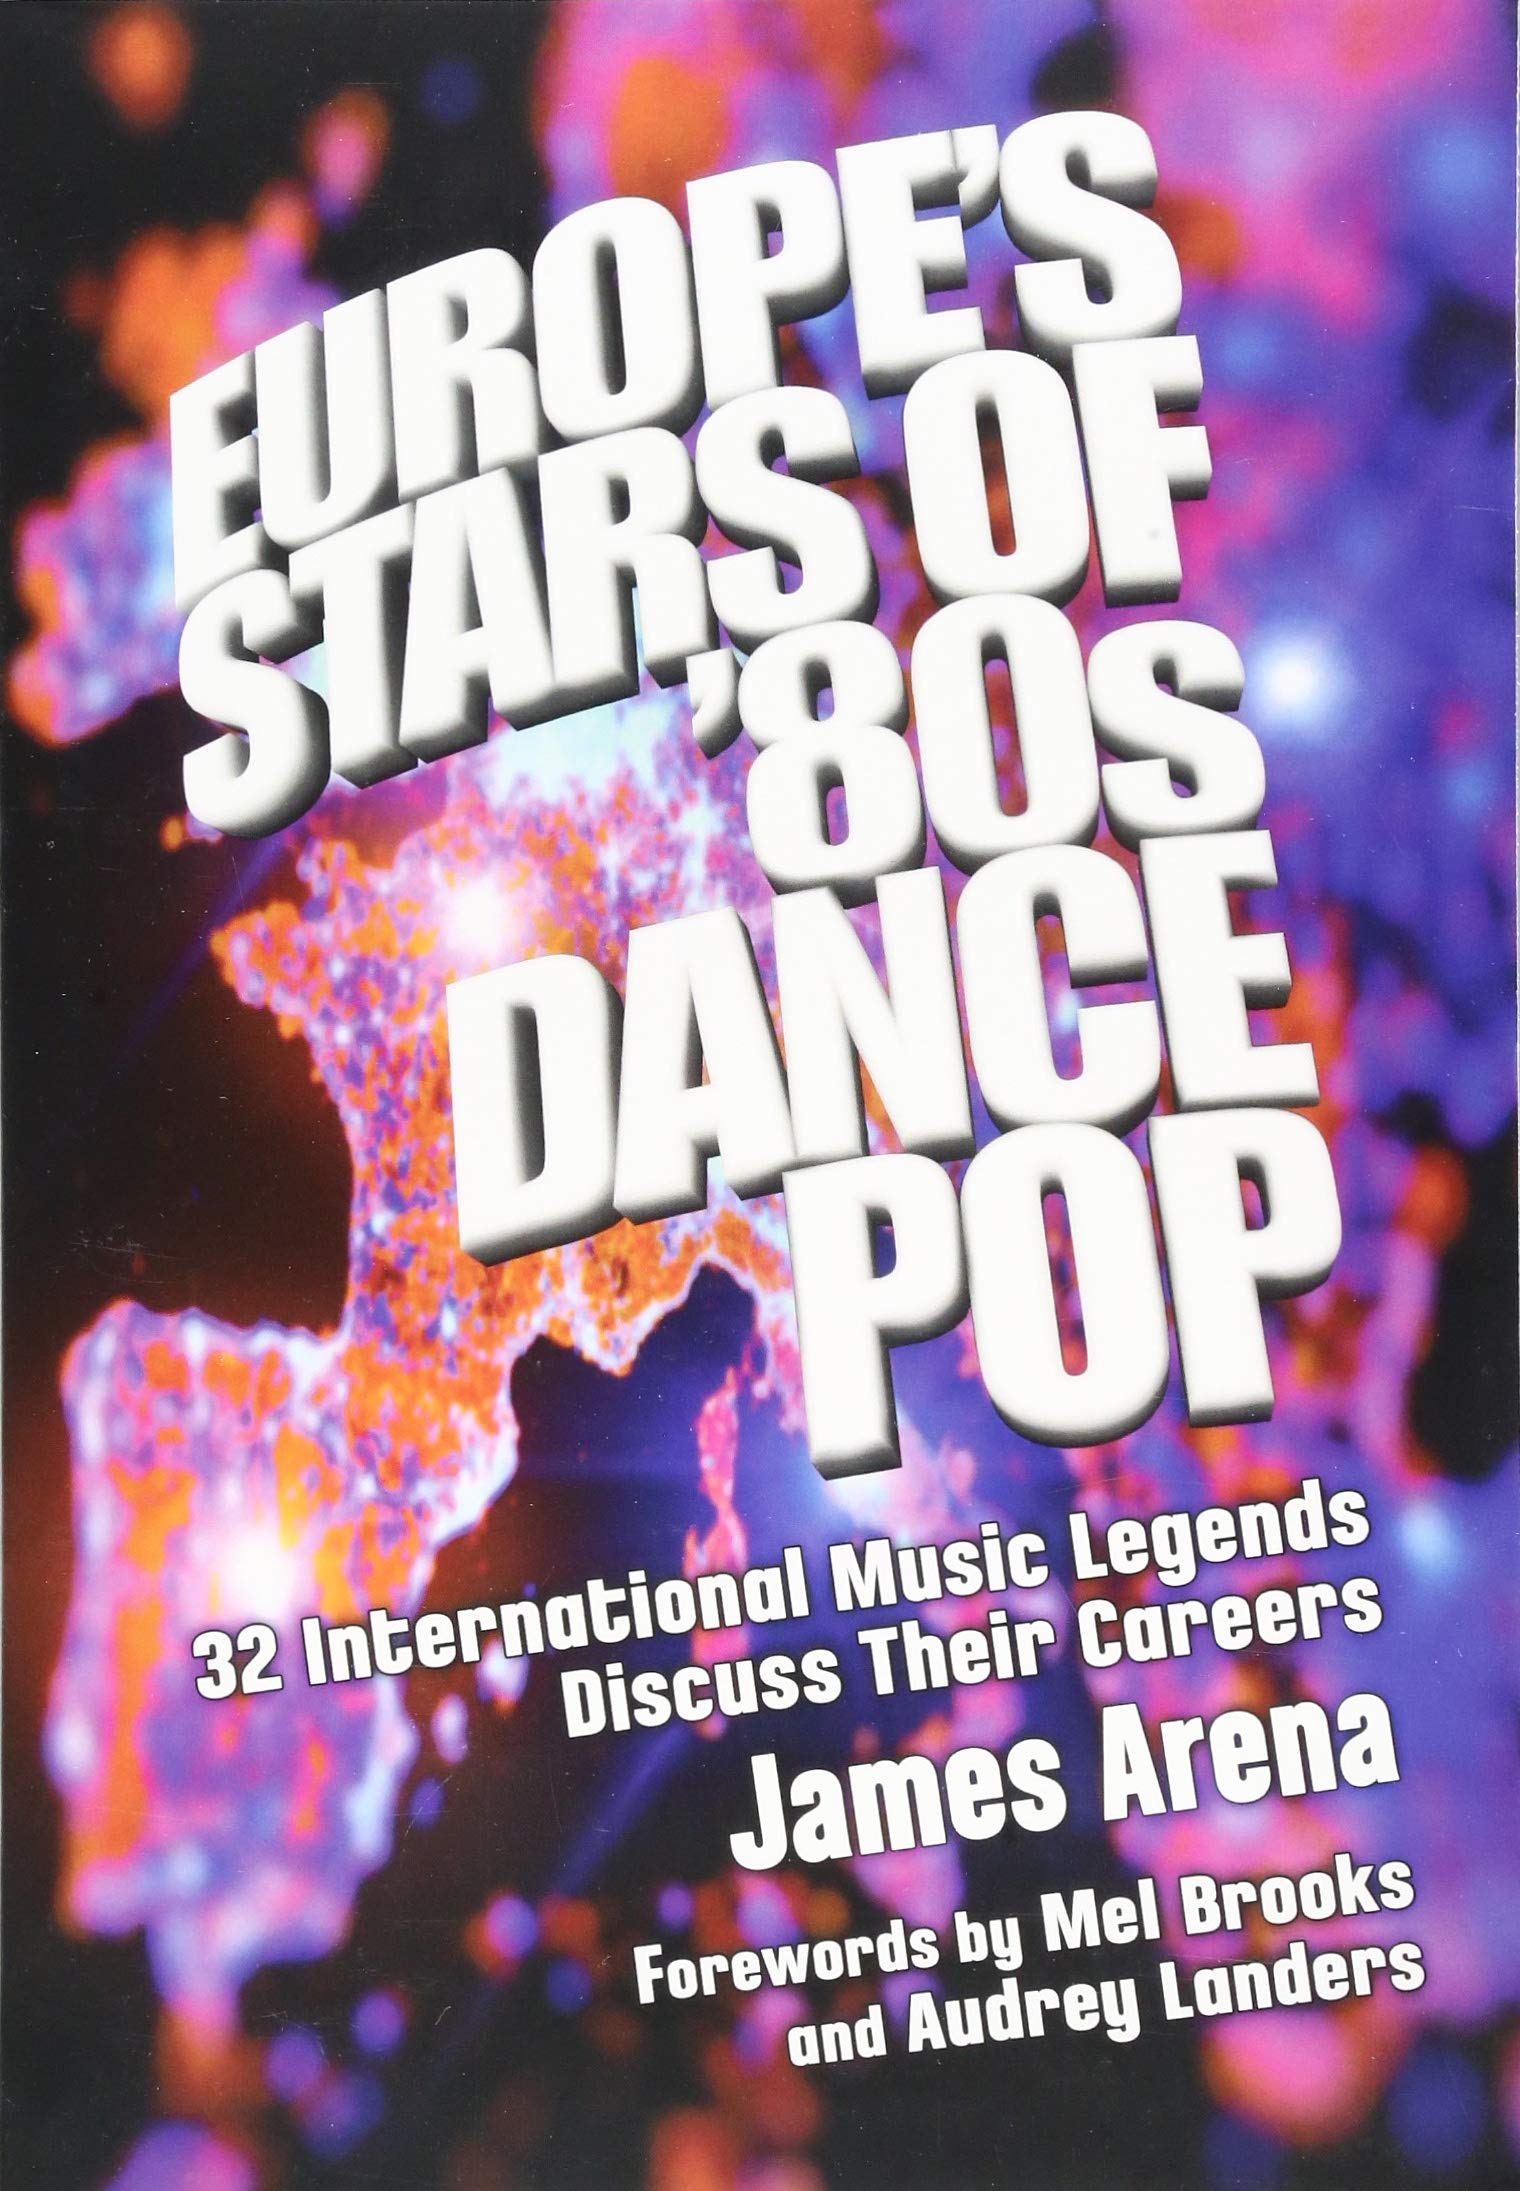 Europe's Stars of '80s Dance Pop: 32 International Music